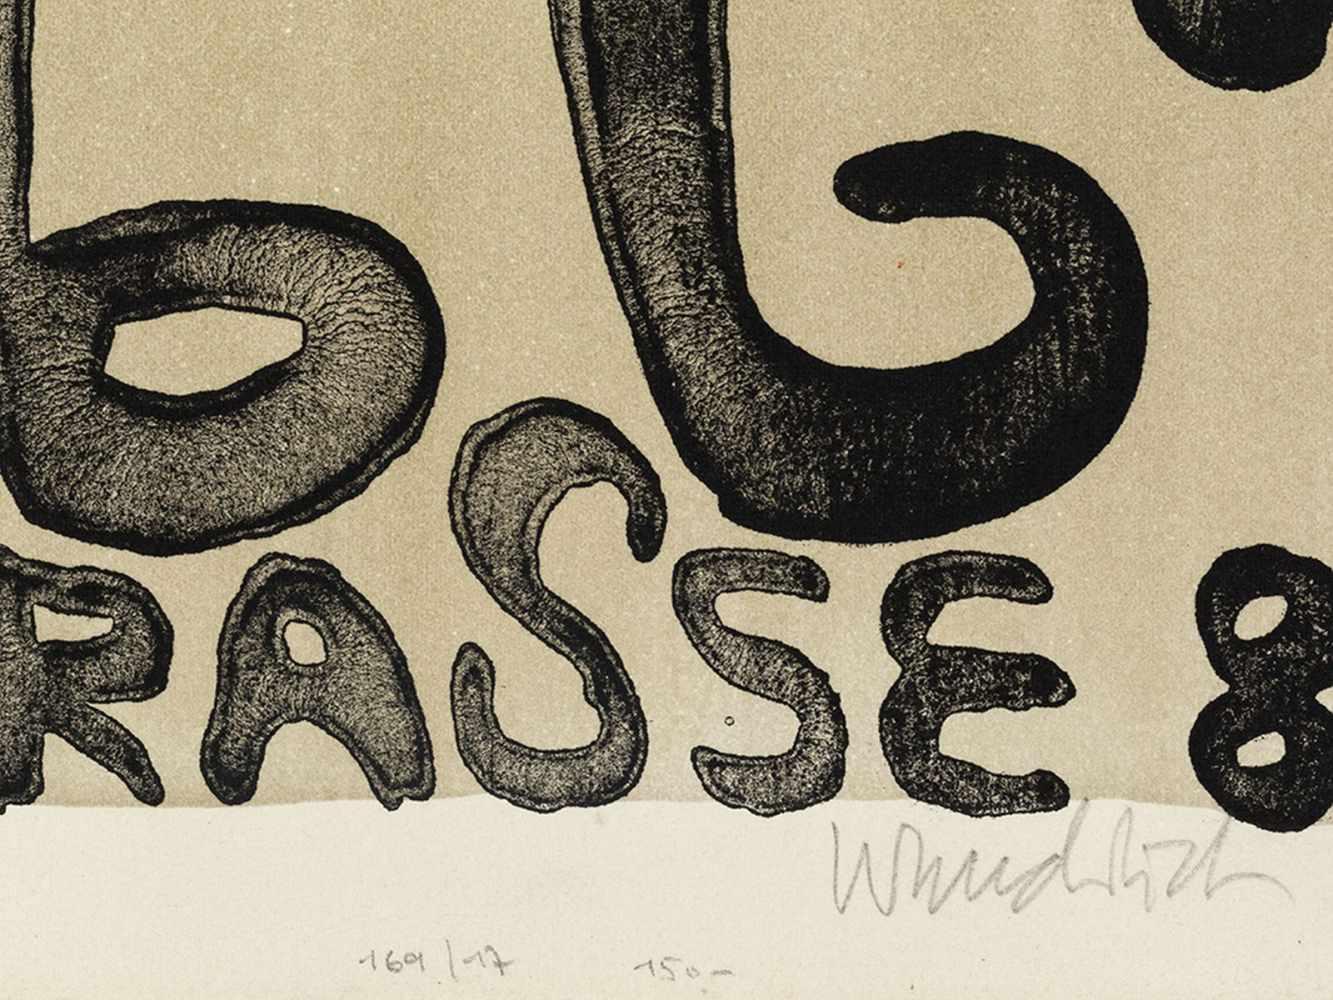 Paul Wunderlich, Kunst + Knoll International, Poster, 1963 - Image 3 of 9